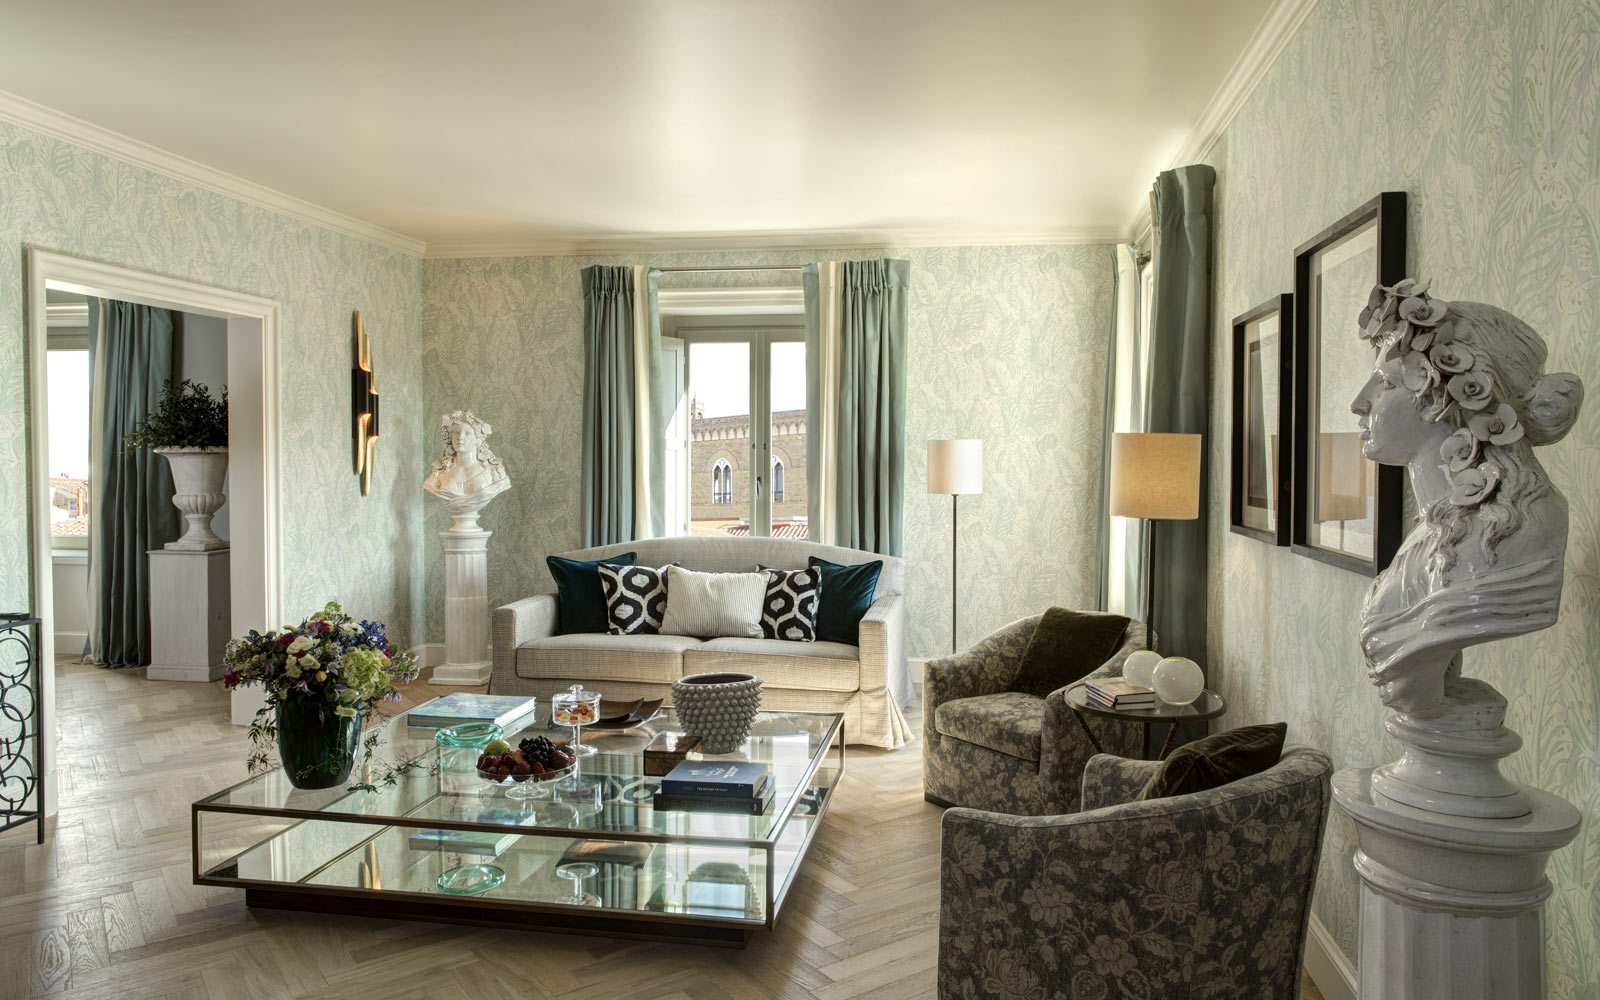 Hotel Savoy Grand View Suite